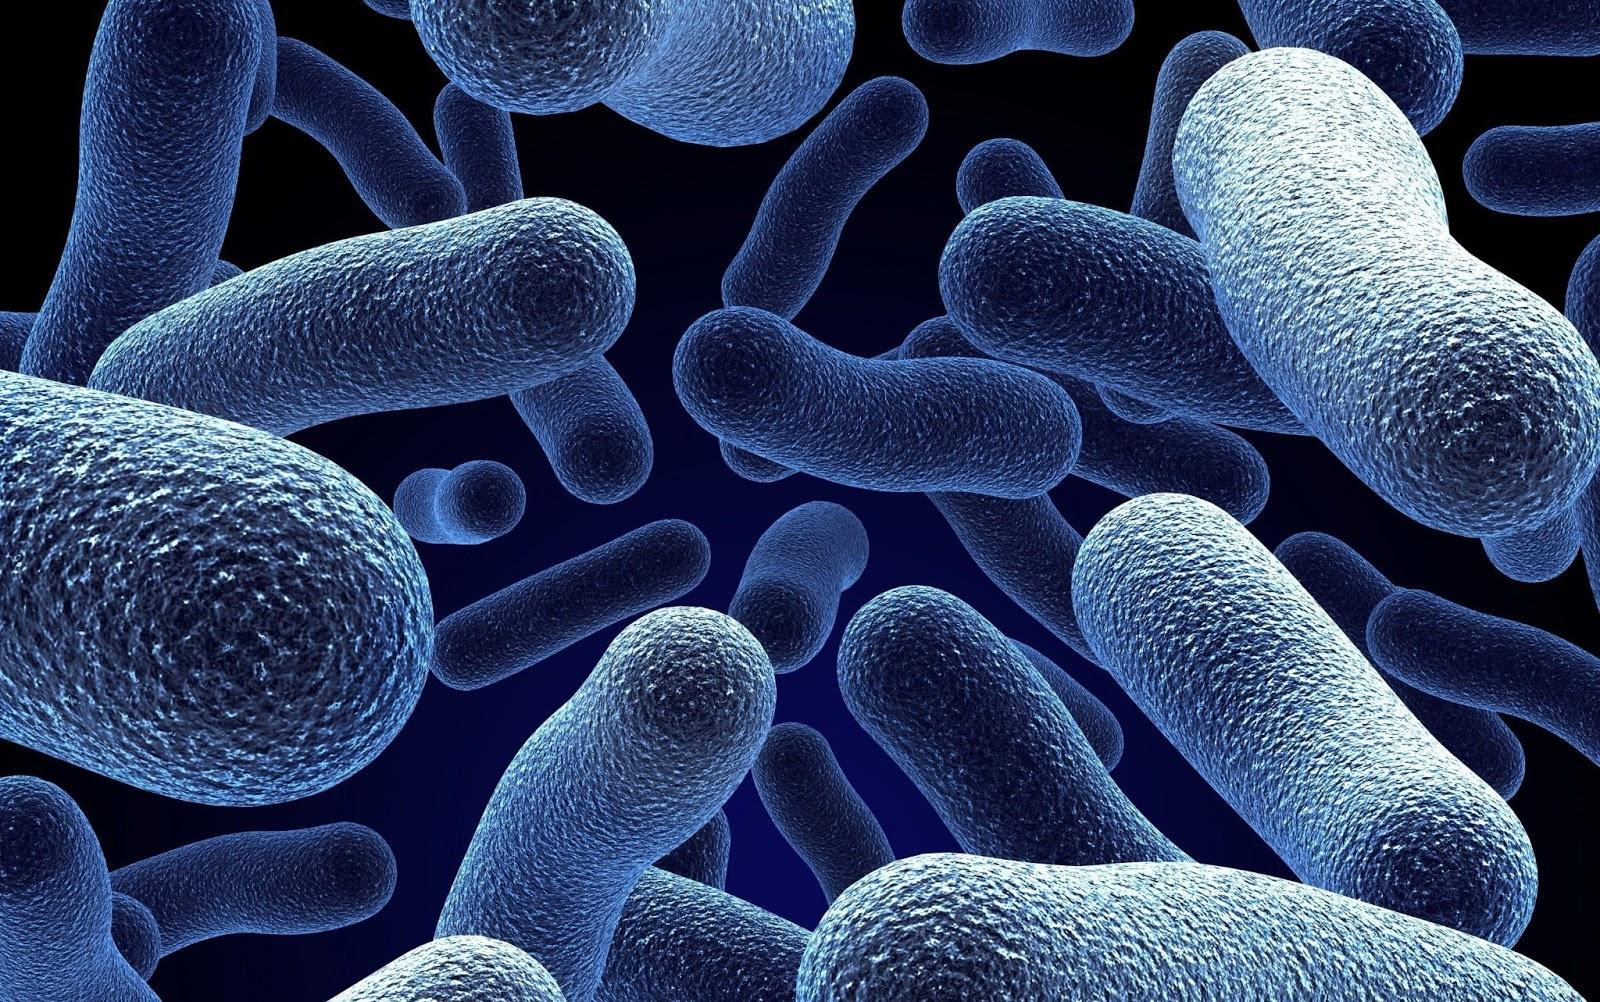 Microbiome Core Image